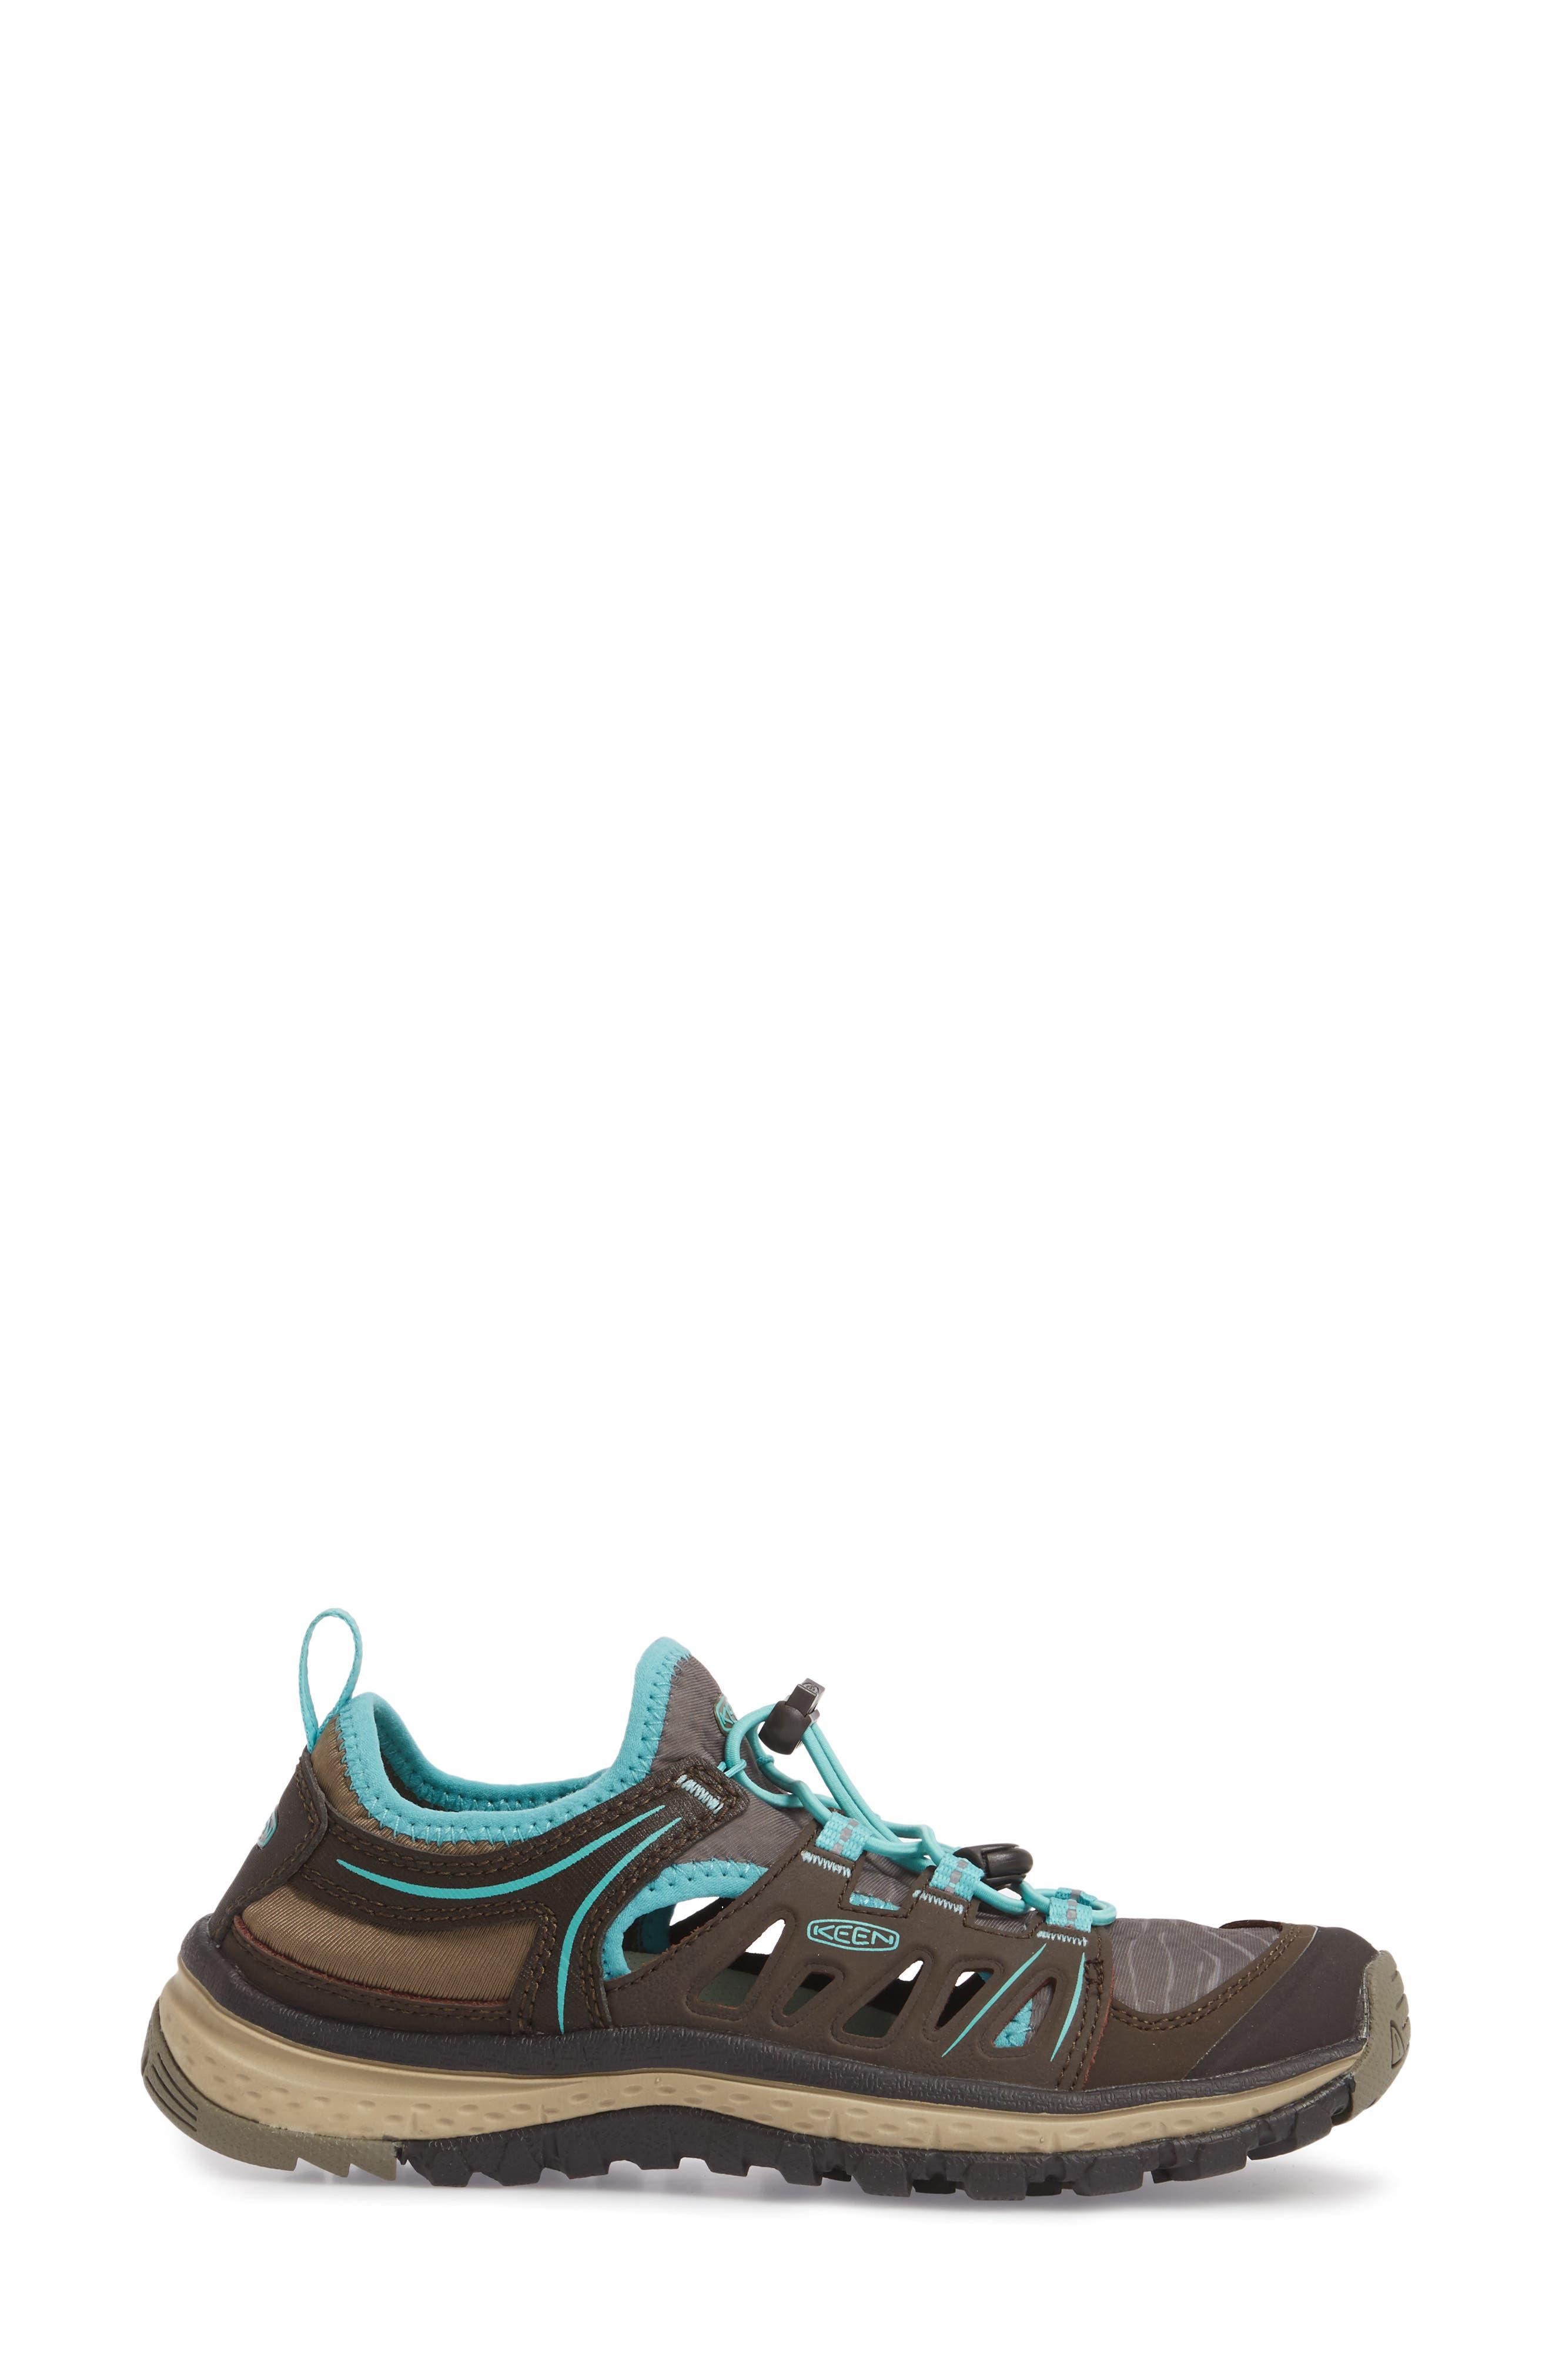 Alternate Image 3  - Keen Terradora Ethos Hiking Sneaker (Women)